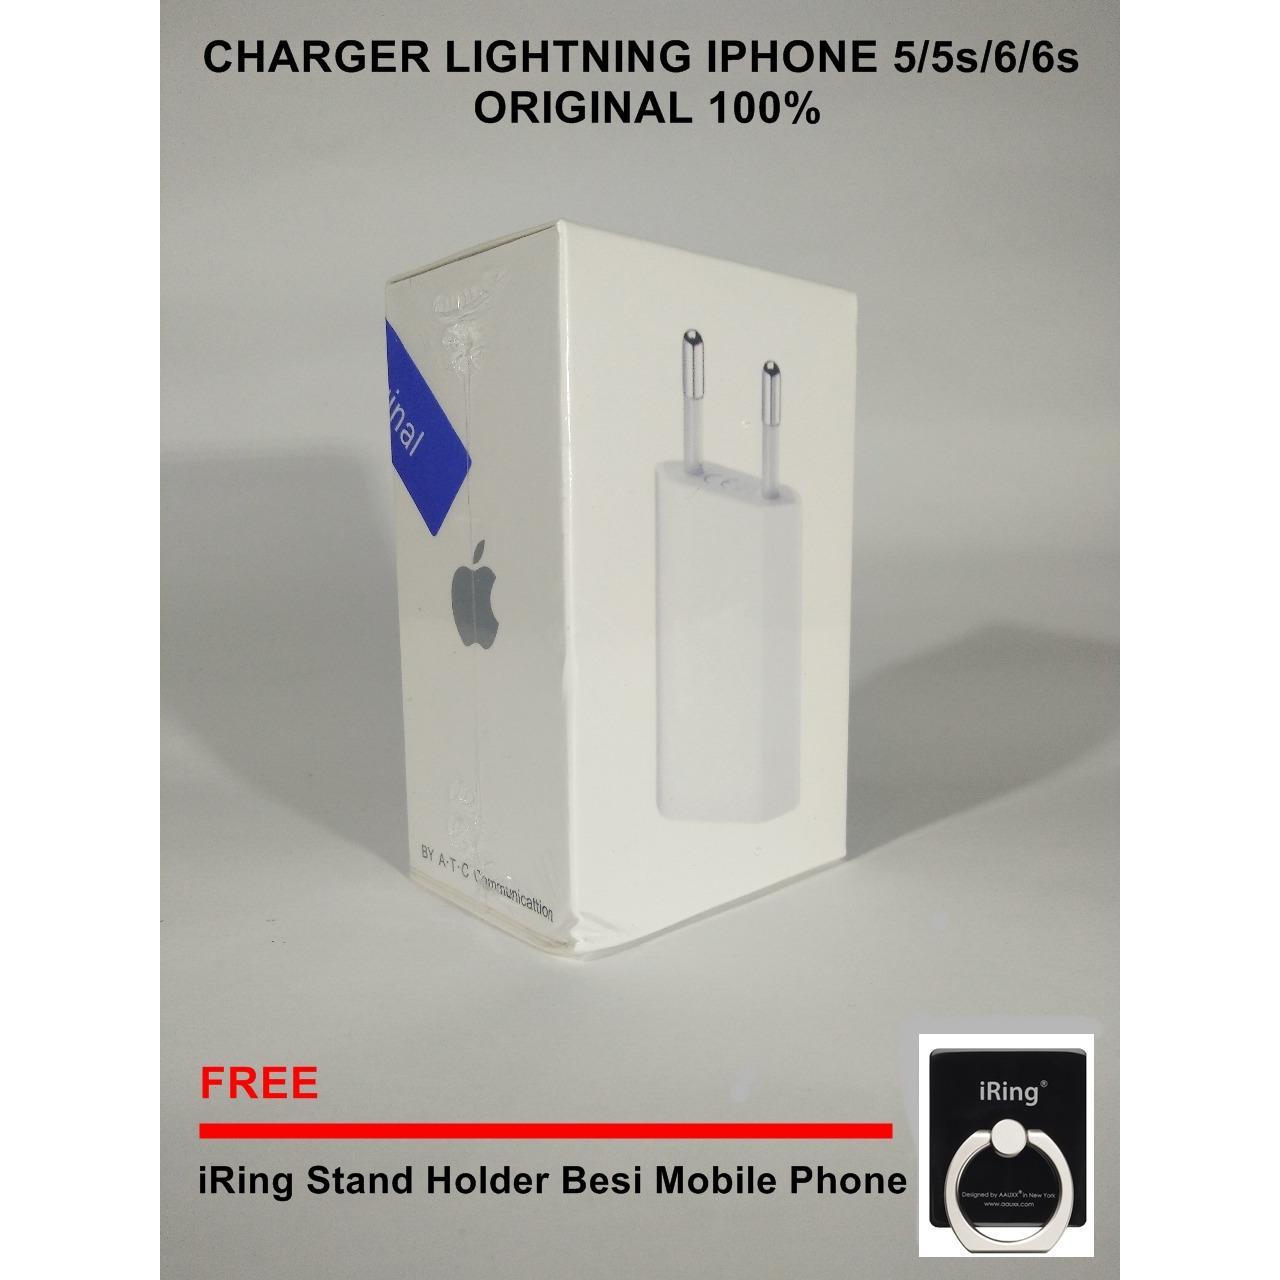 Gold Store Charger + Kabel iPhone 5 / 5s / 6 / 6+ ORIGINAL LIGHTNING